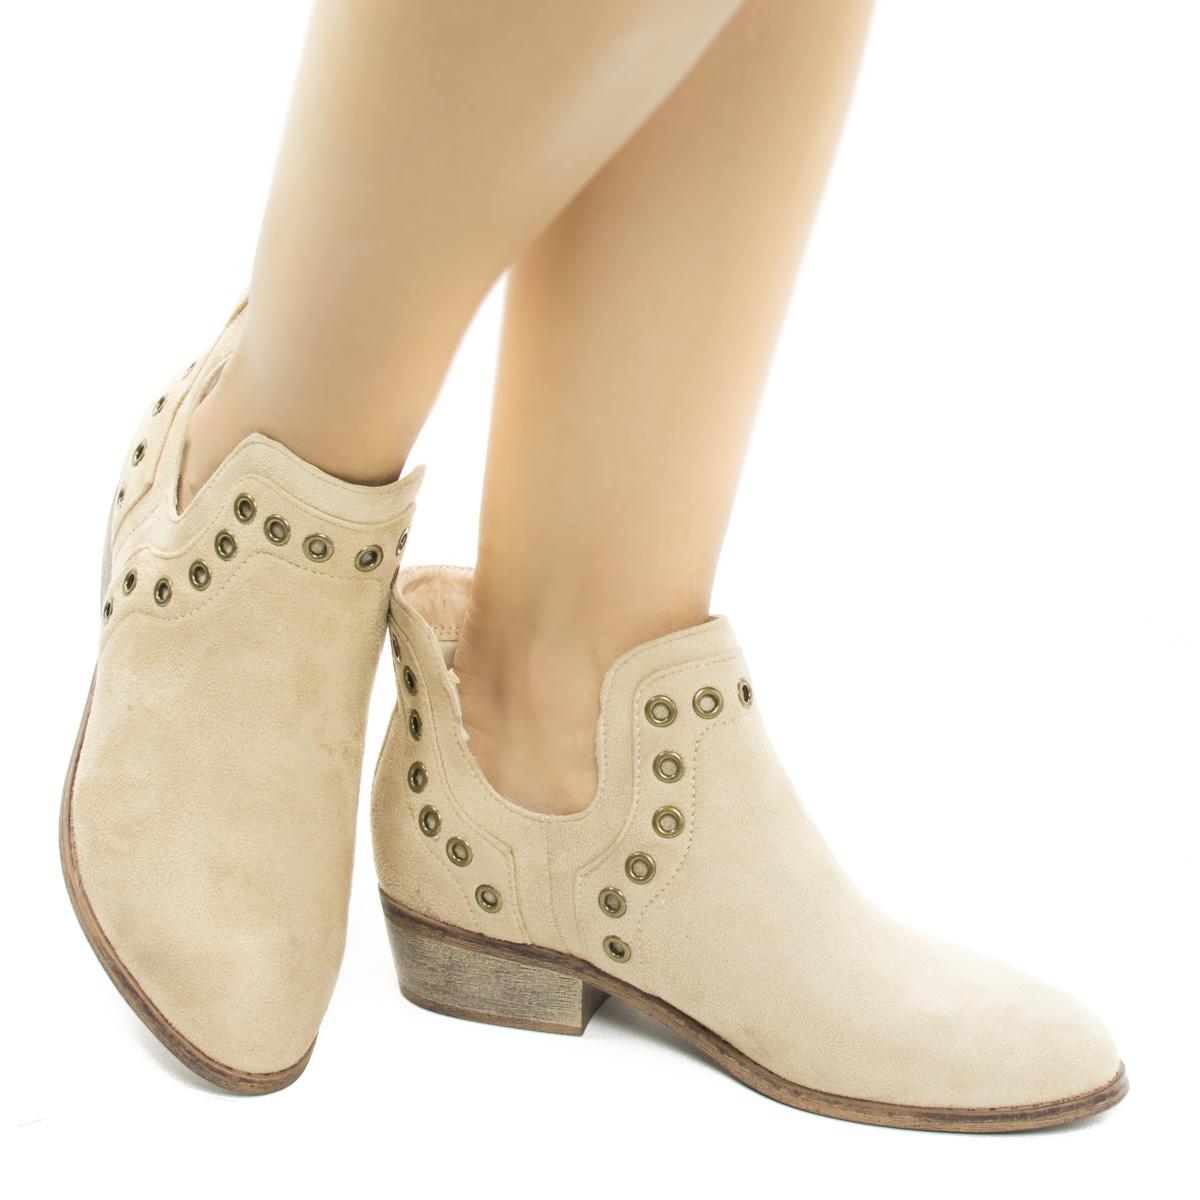 Mojave03 Women Western Pull On Ankle Booties W Side Slit & Metal Detail